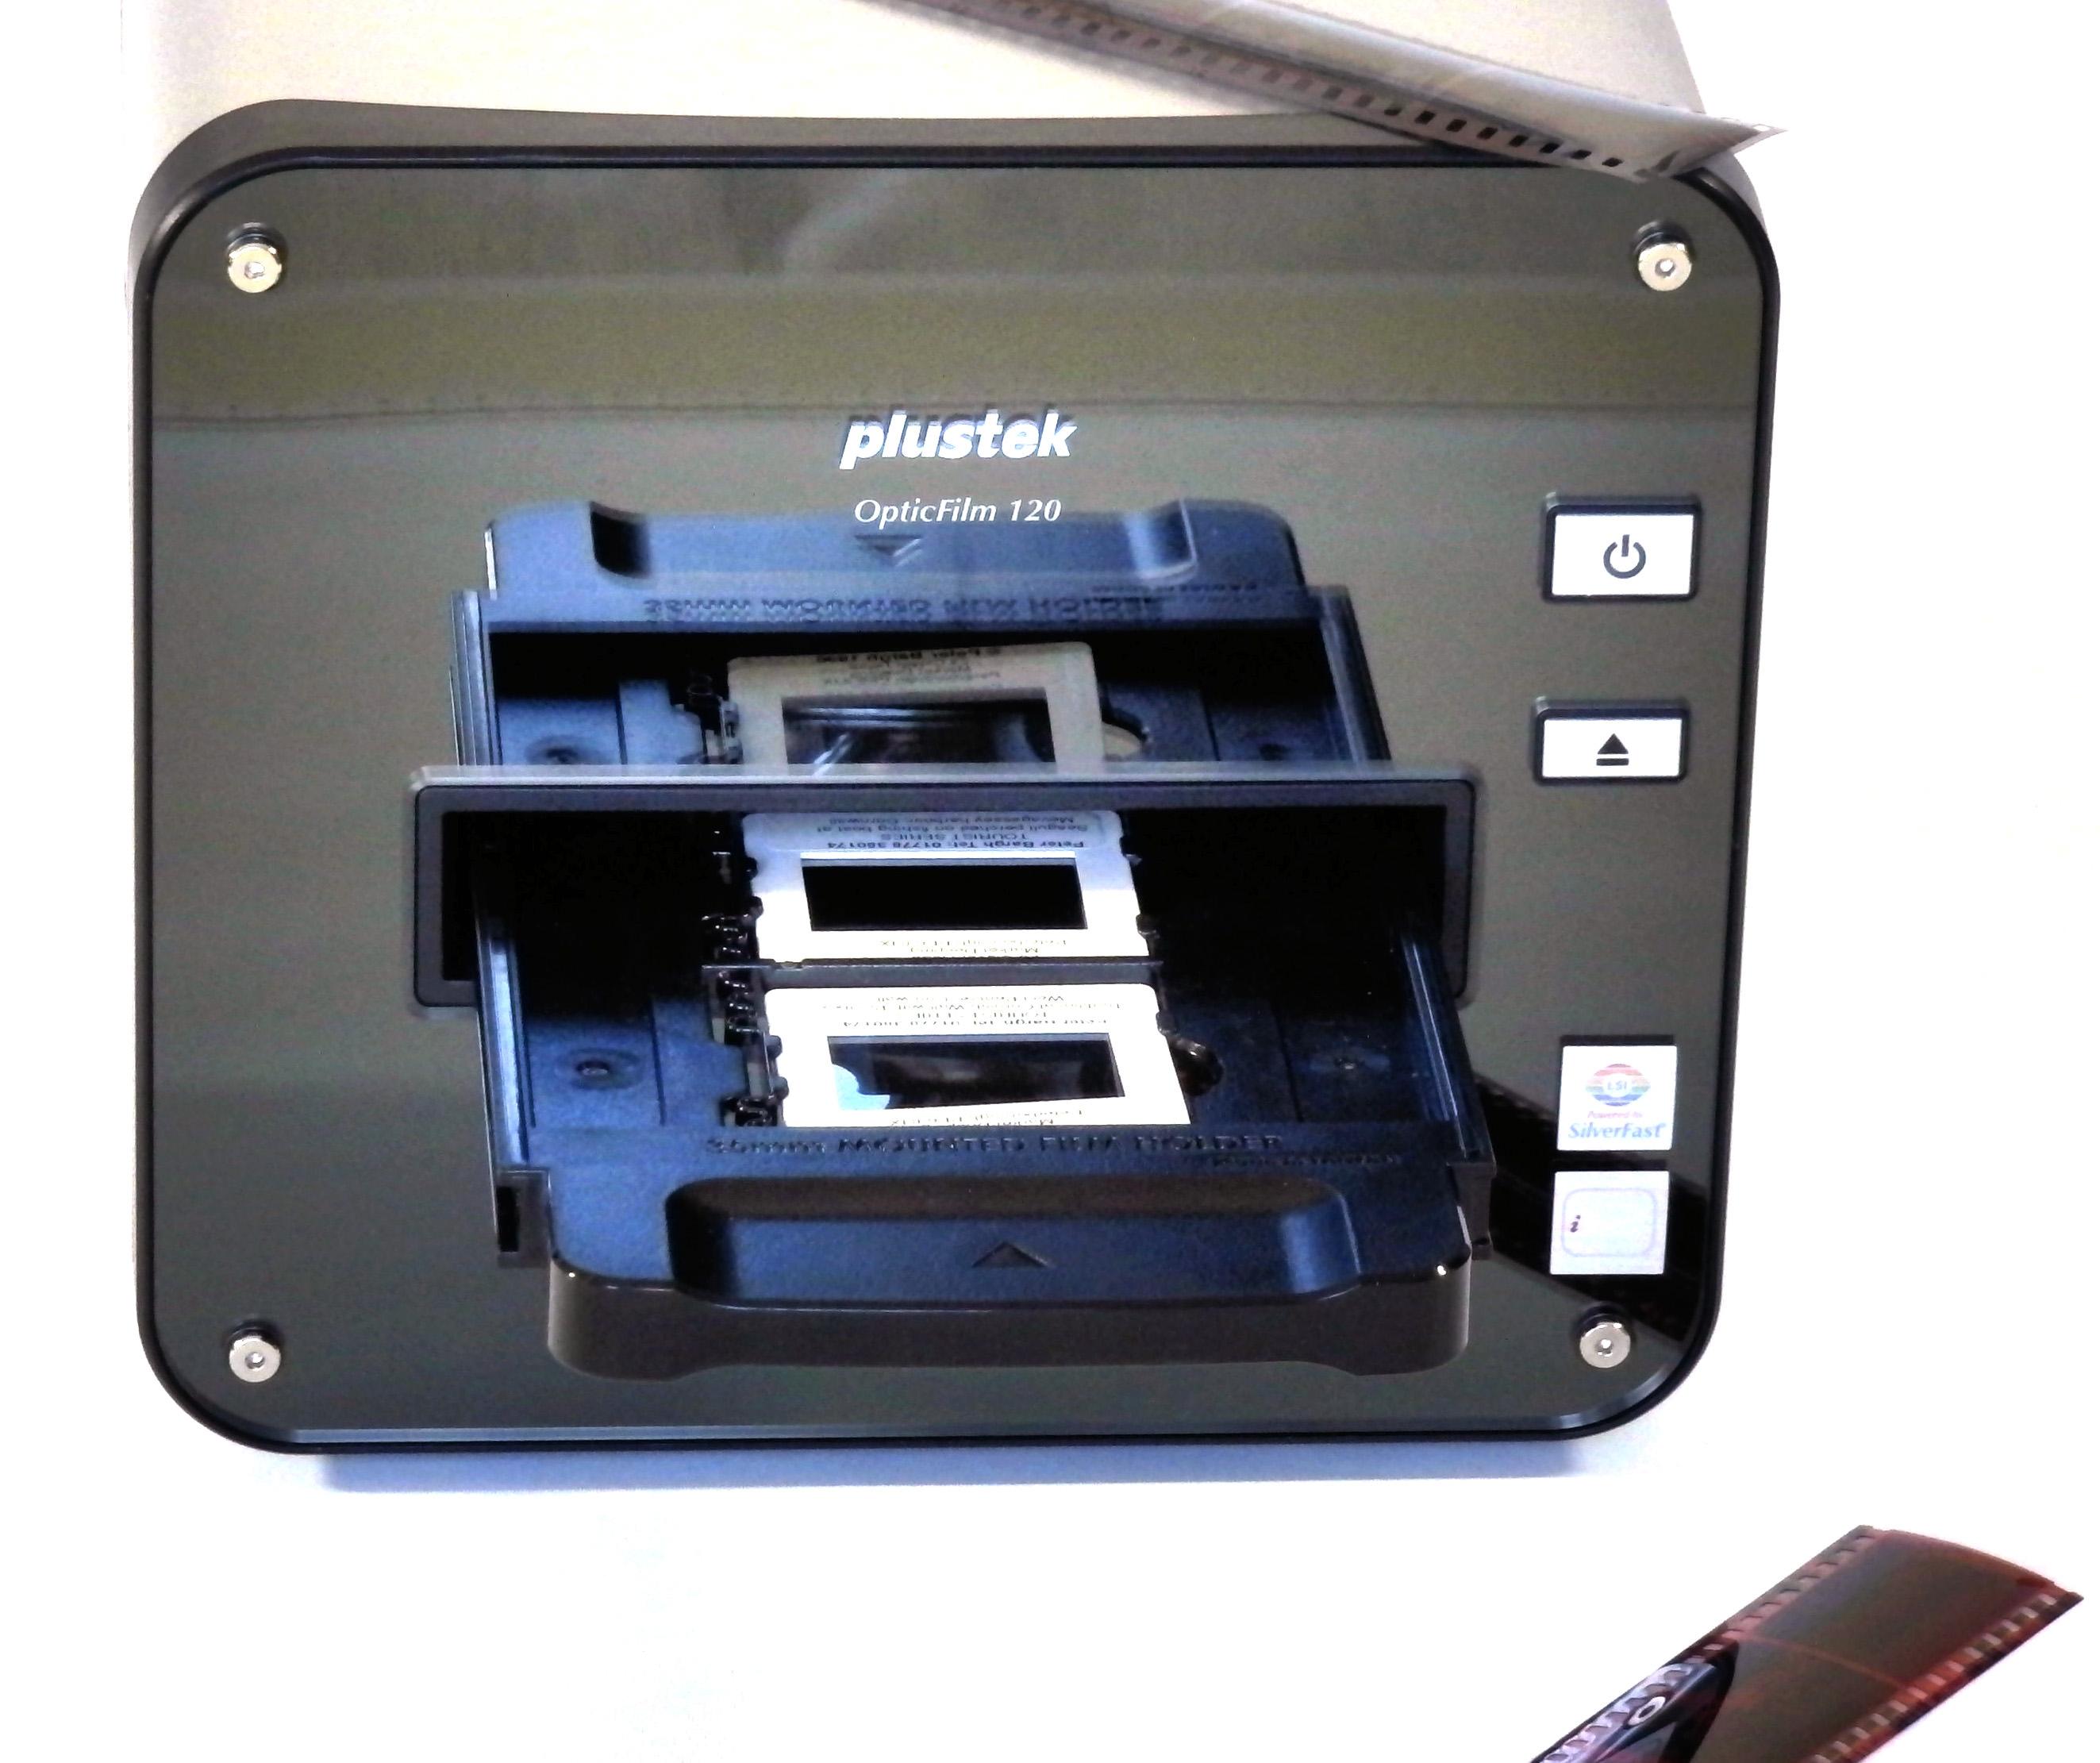 Plustek OpticFilm 120 Film Scanner Review | ePHOTOzine